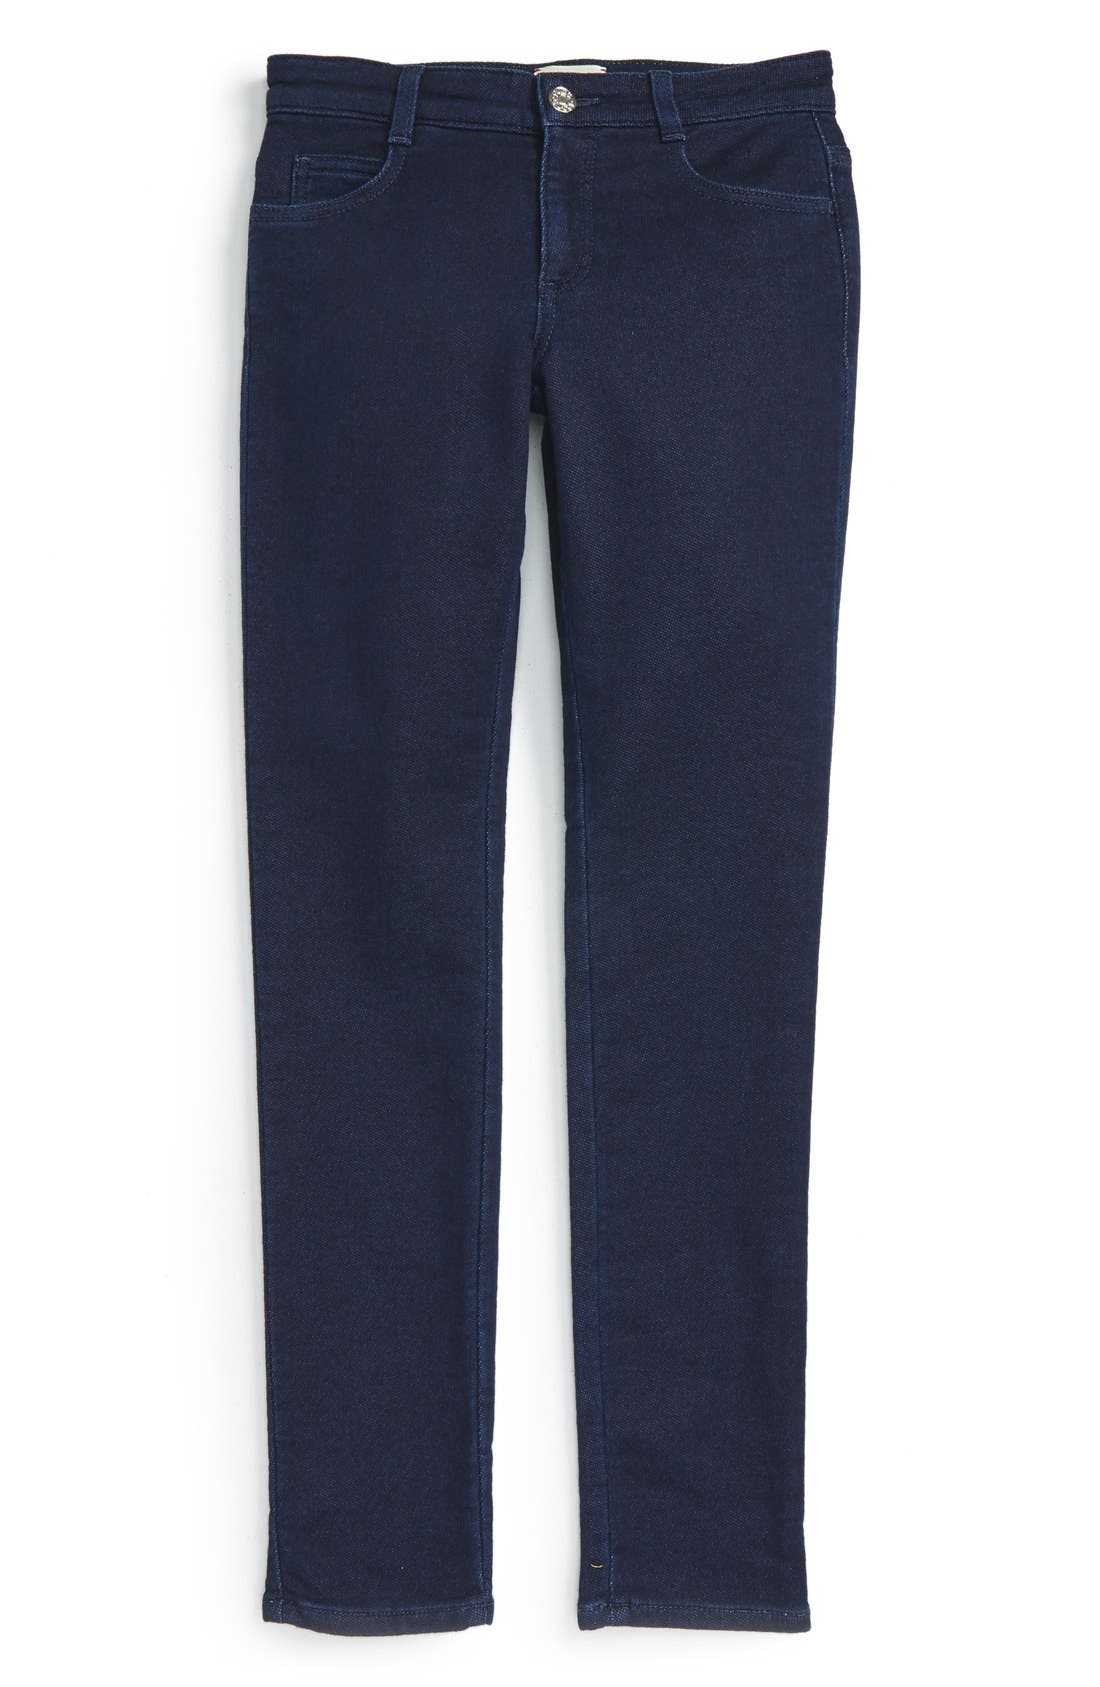 Skinny Knit Pants,                         Main,                         color, Indigo Multi